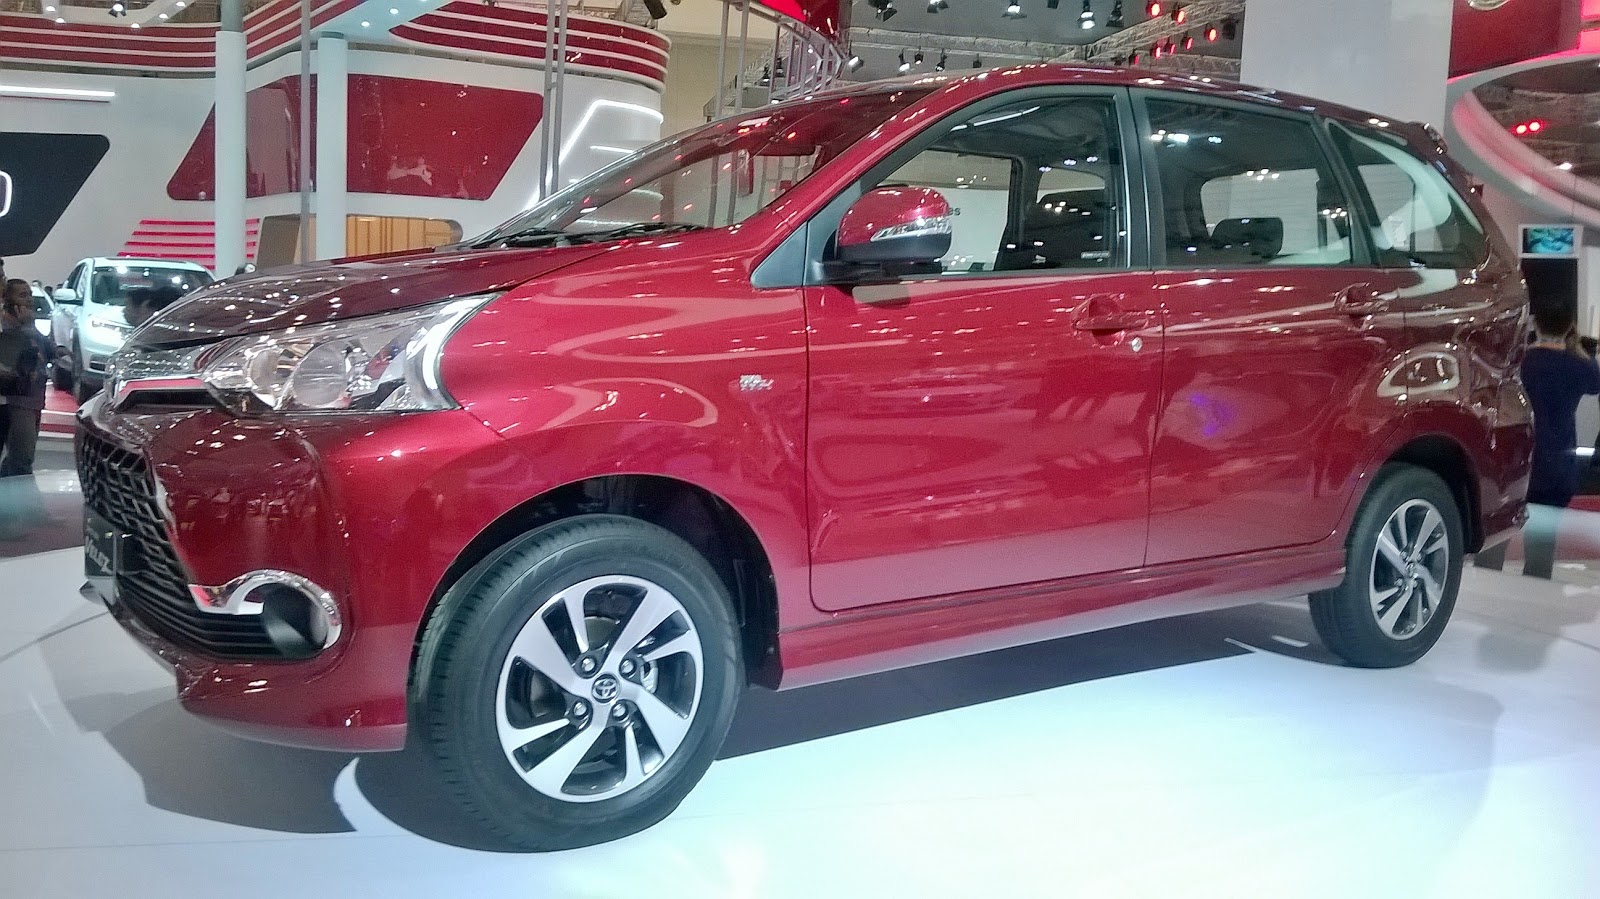 Jual Velg Grand New Veloz All Kijang Innova 2017 Cara Cerdas Memilih Mobil Keluarga Didno76